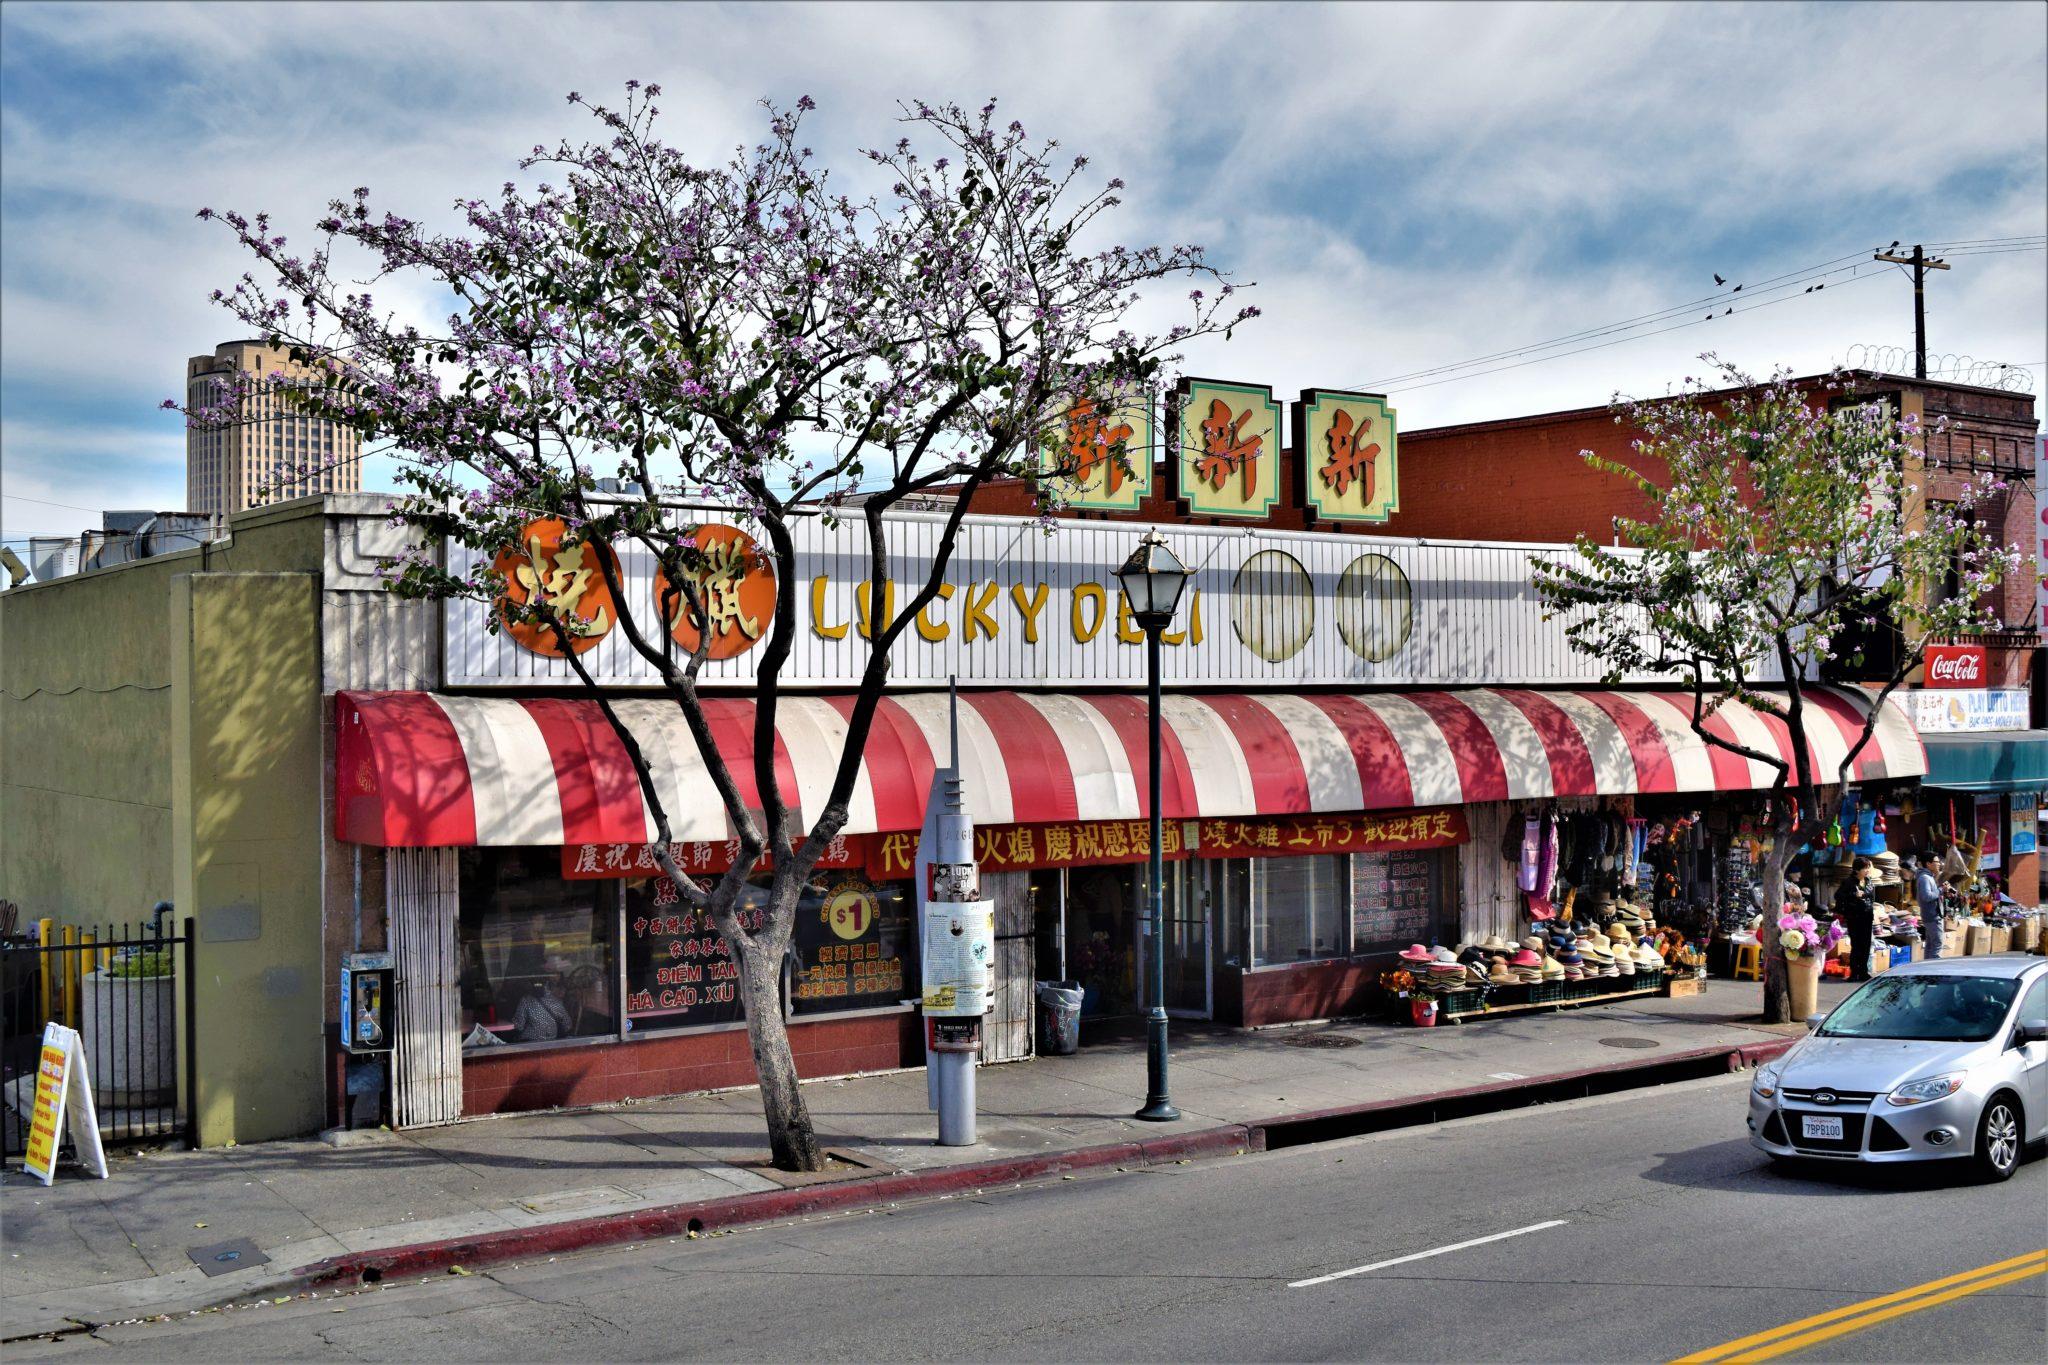 Lucky Delhi, Chinatown, Los Angeles